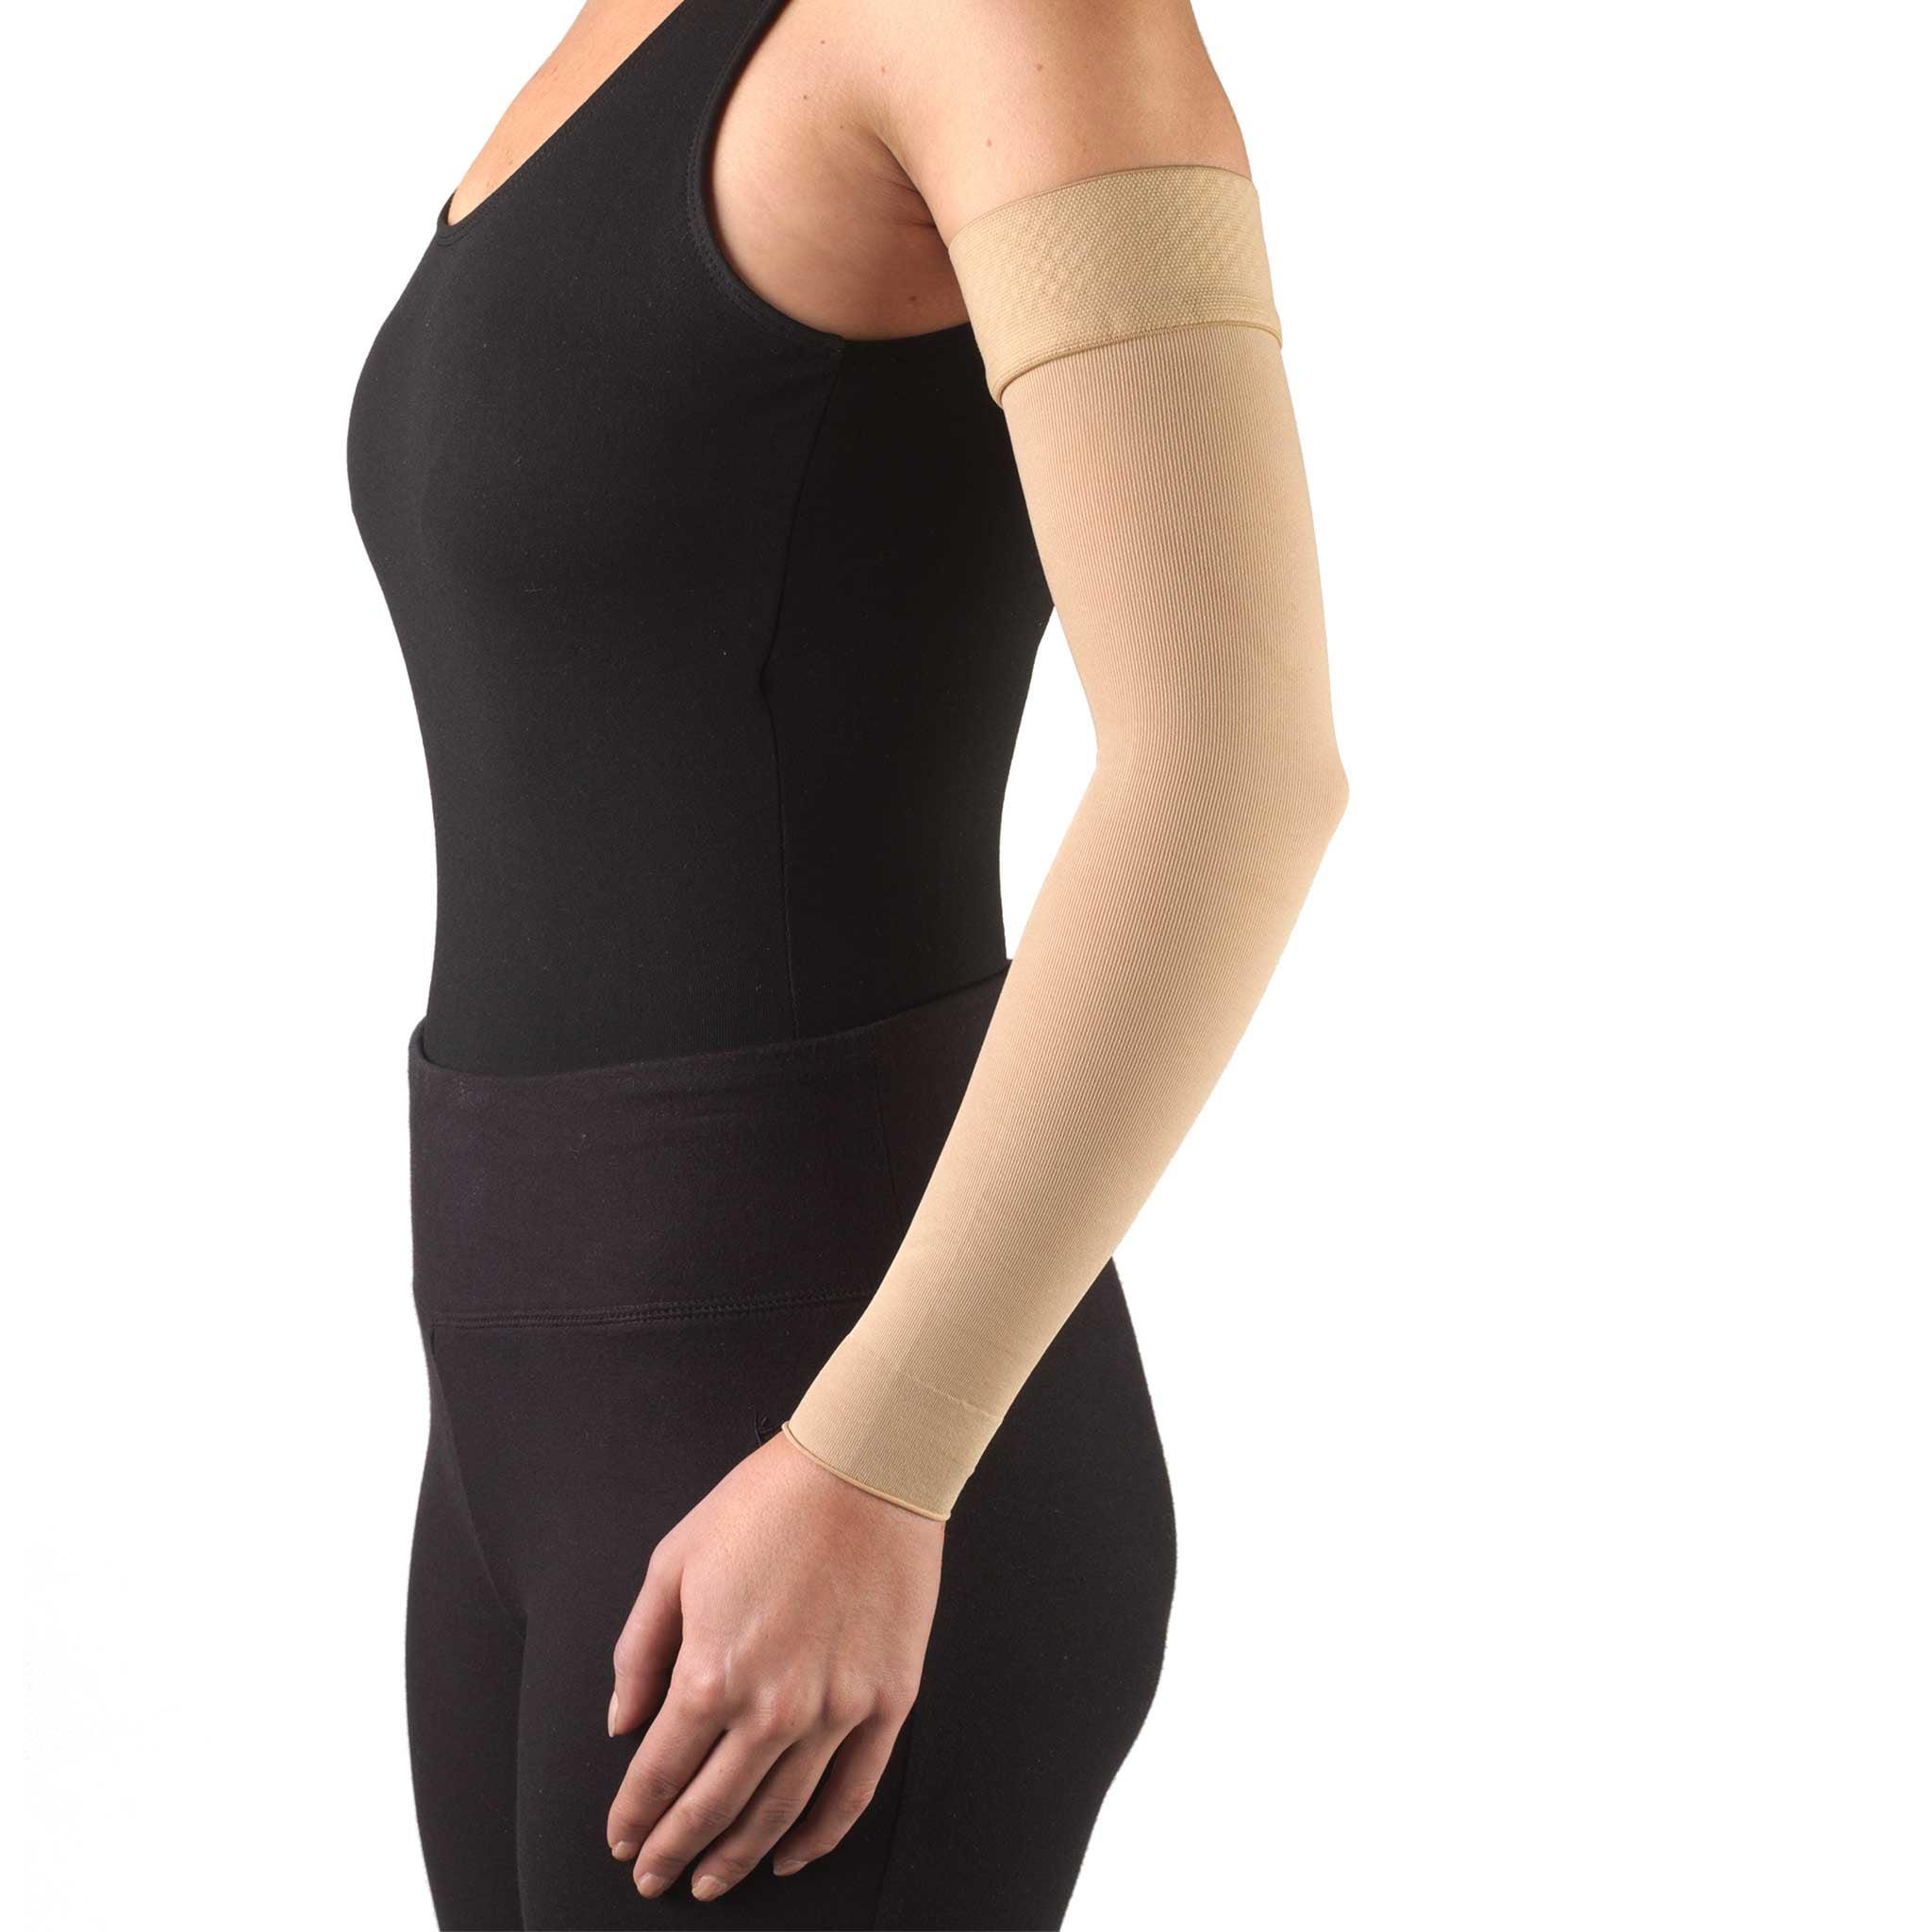 Truform Lymphedema Compression Arm Sleeve, Dot Top: 20-30 mmHg, Black, Small